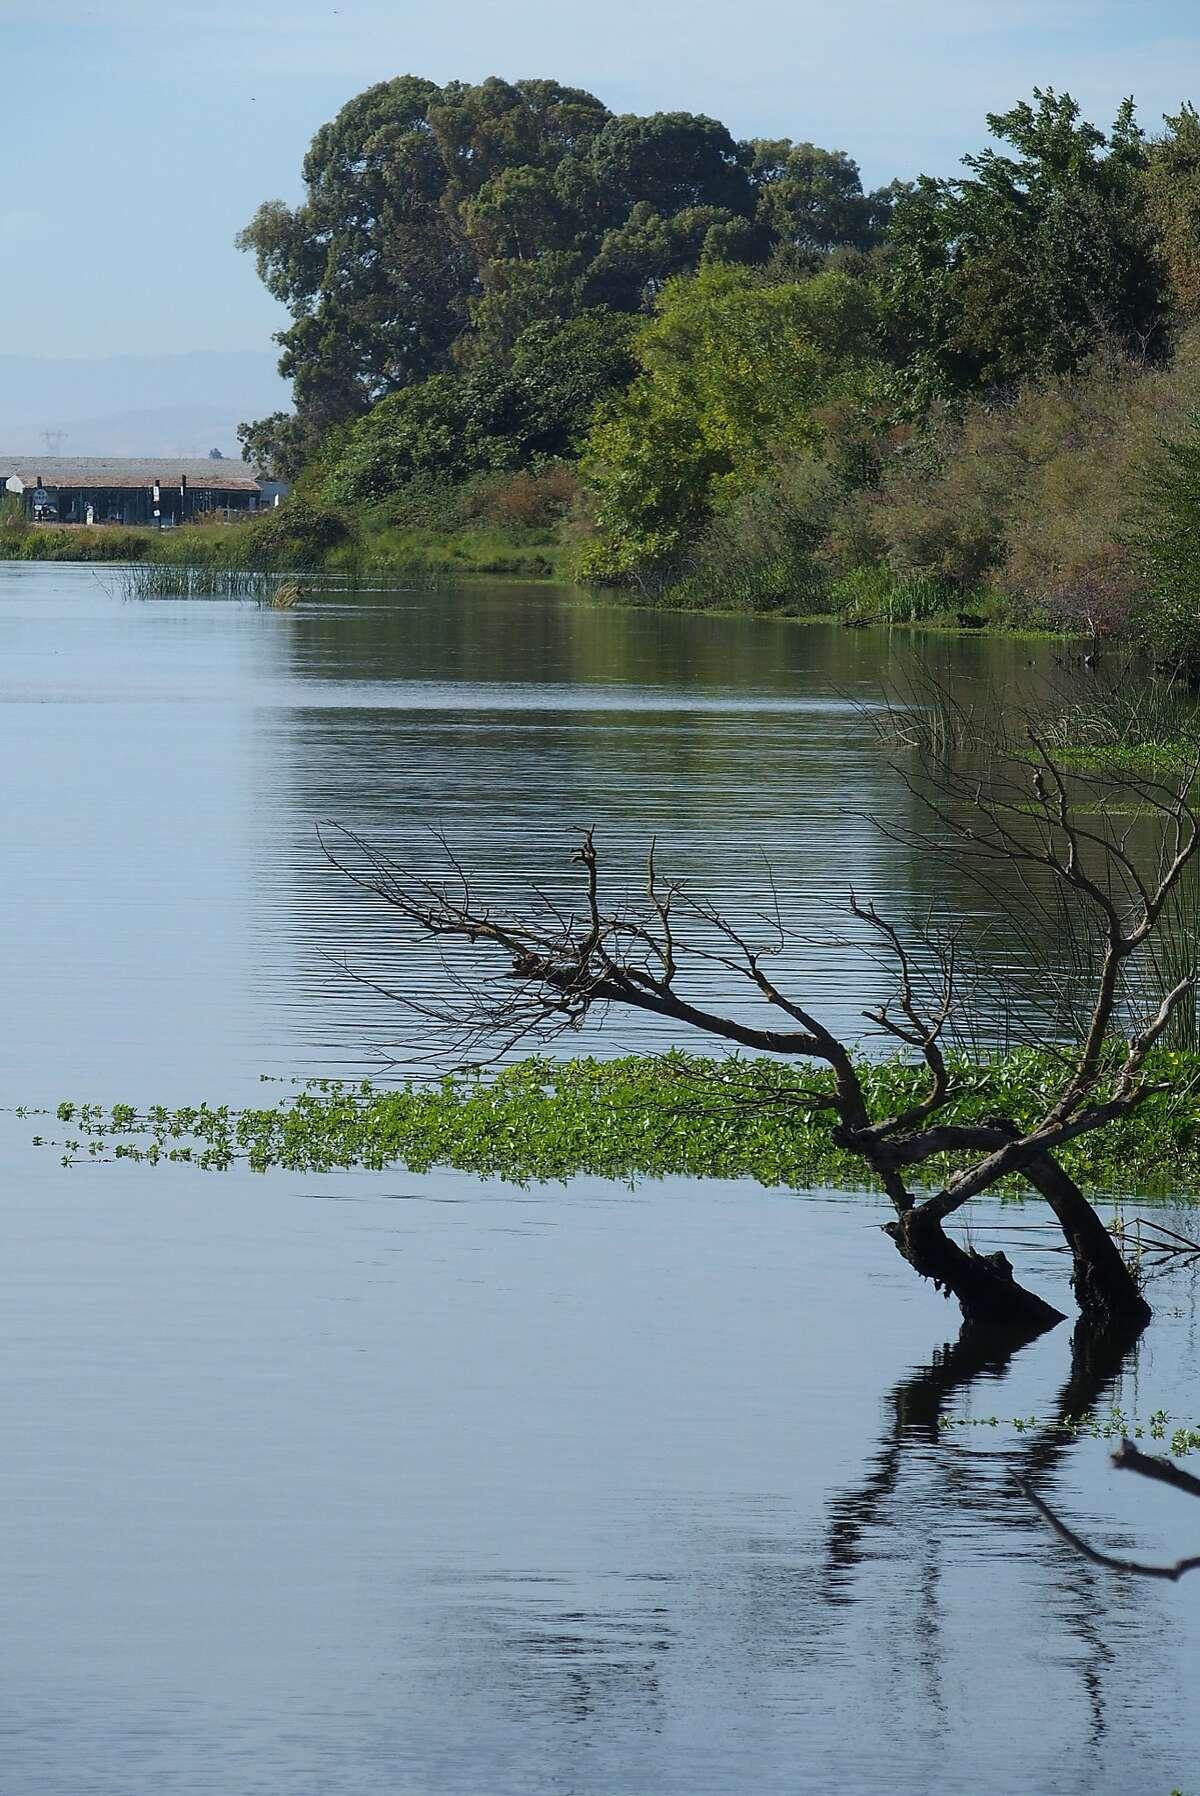 Scenery around Brannan Island State Recreation Area near Rio Vista.